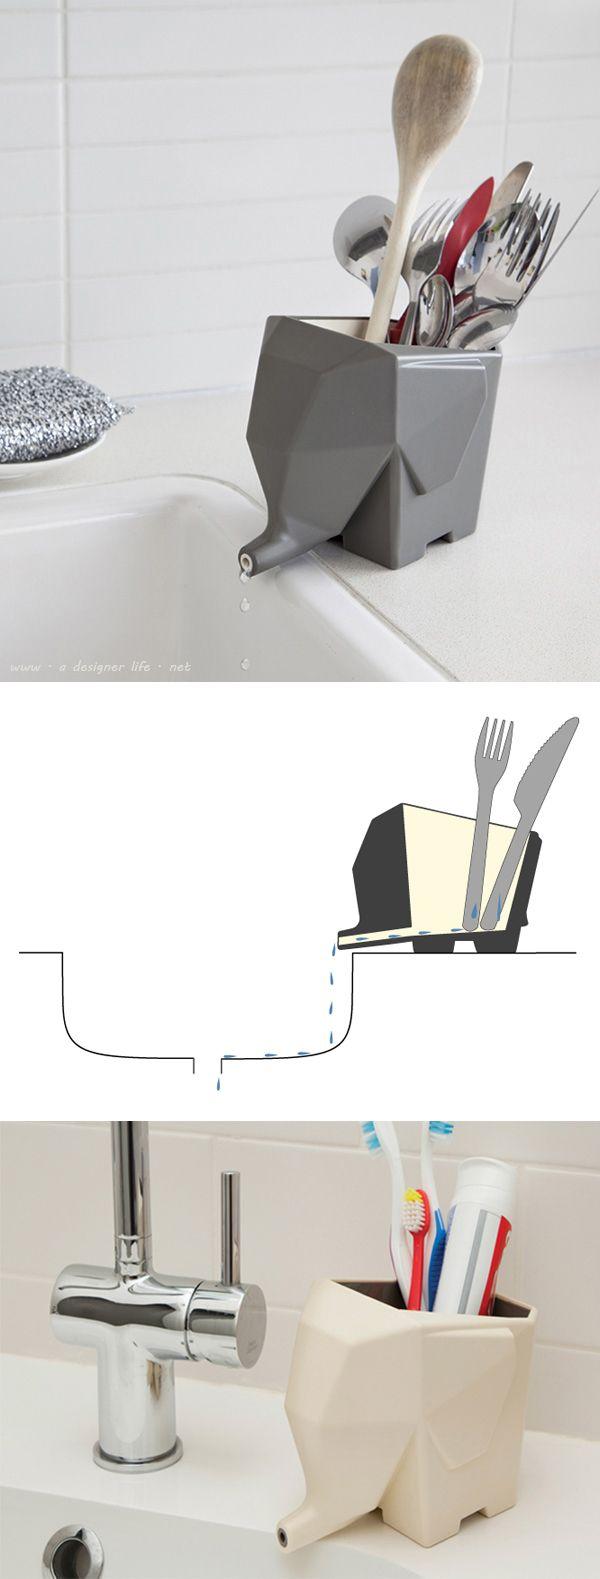 kitchen supplies product design concrete design beton design